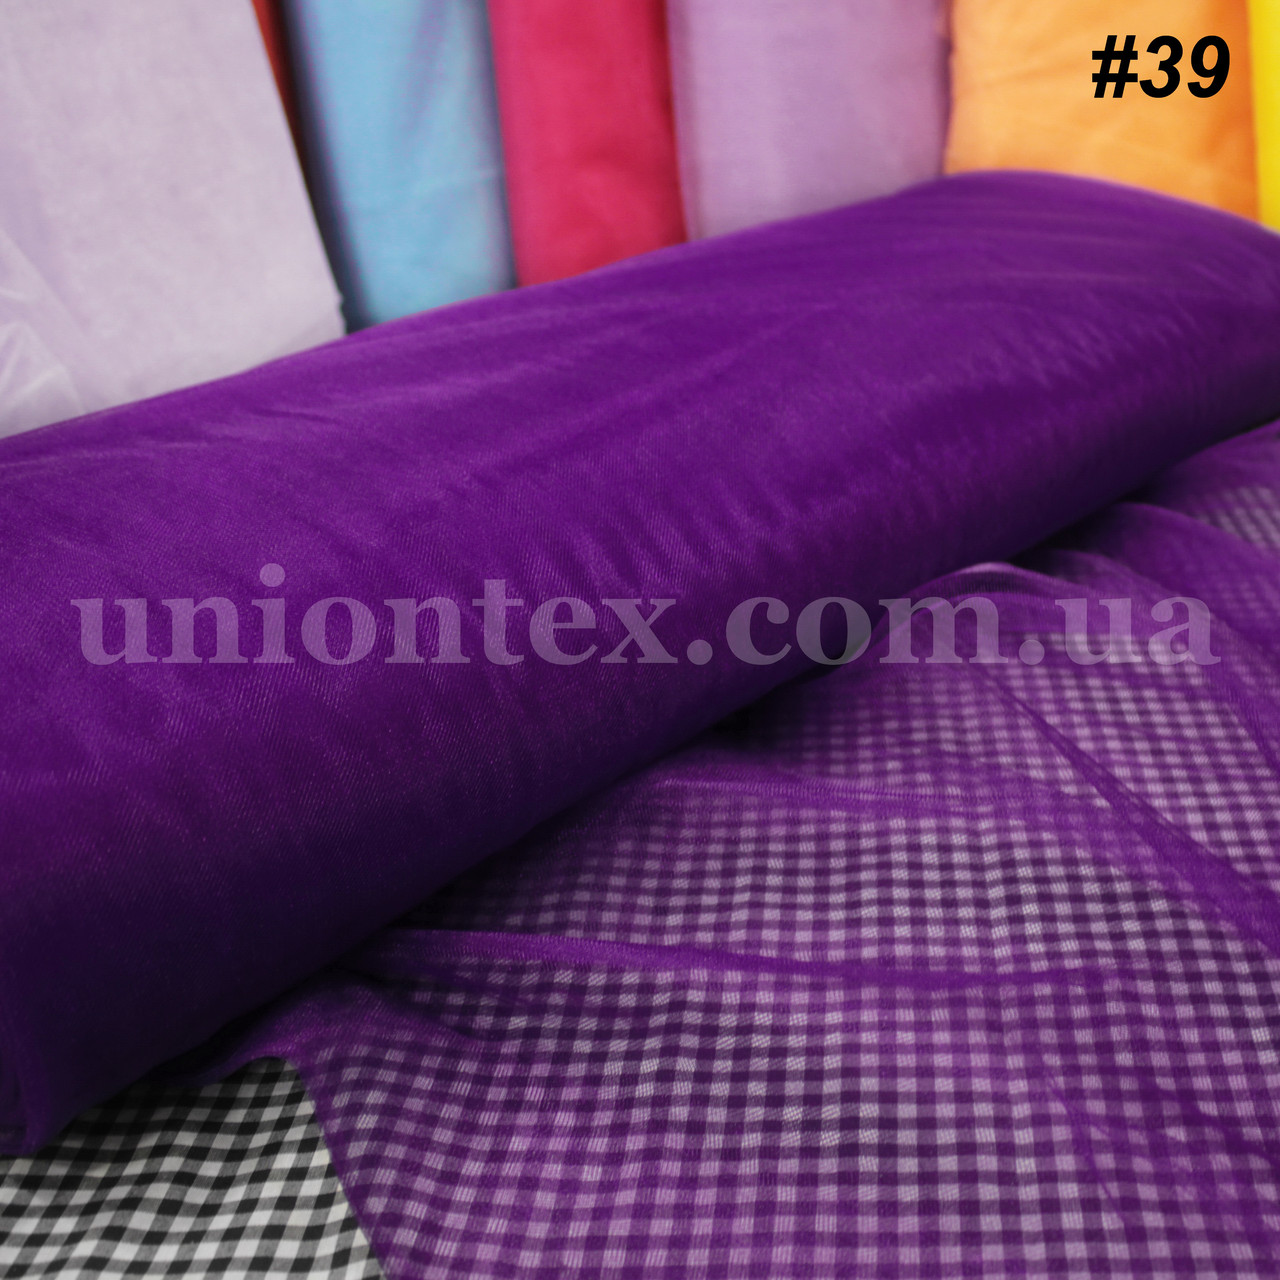 Фатин средней жесткости Kristal tul фиолетовый, ширина 3м